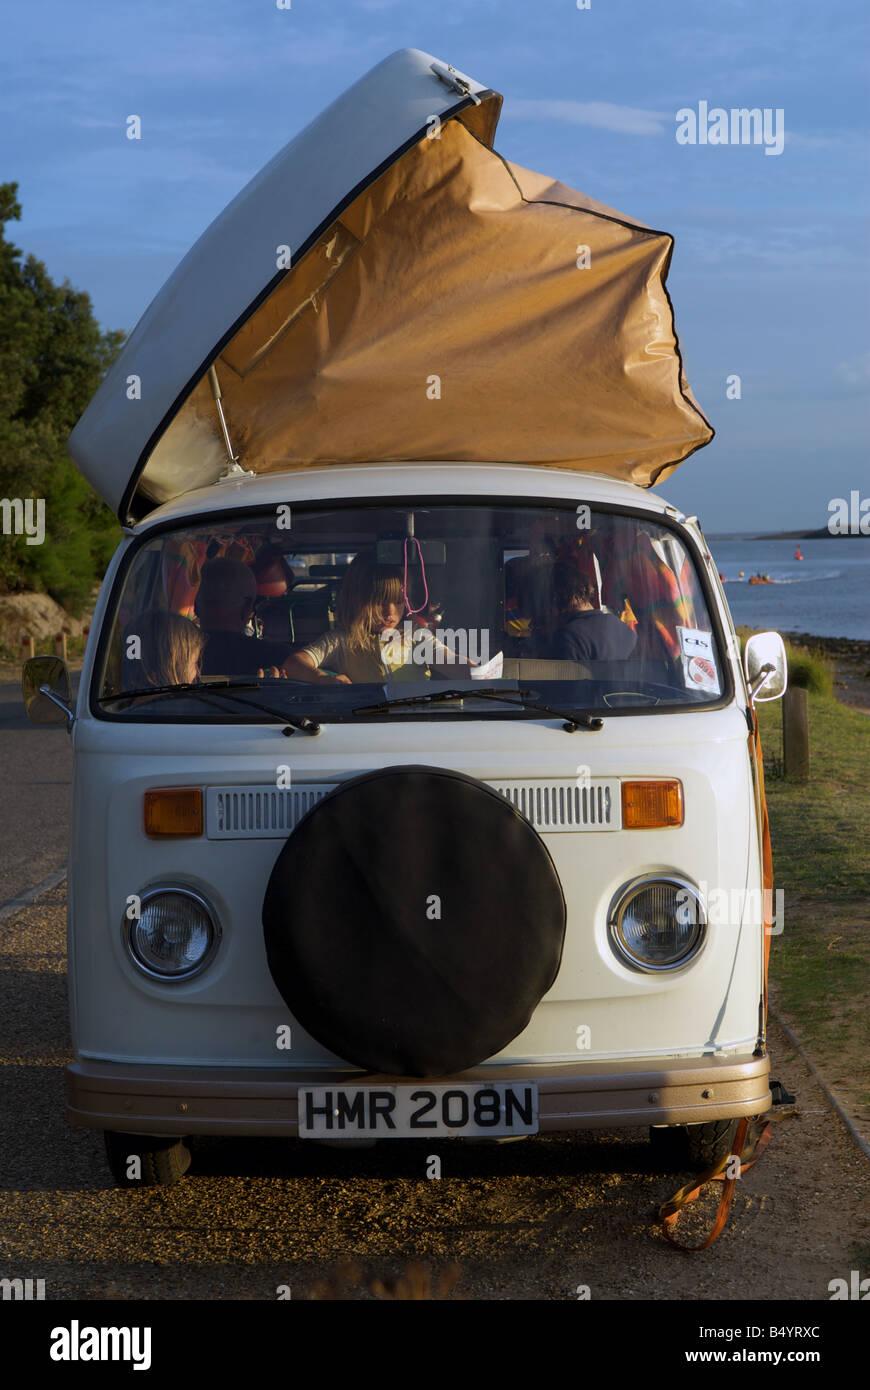 VW camper van, Bawdsey Ferry, Suffolk, UK. - Stock Image